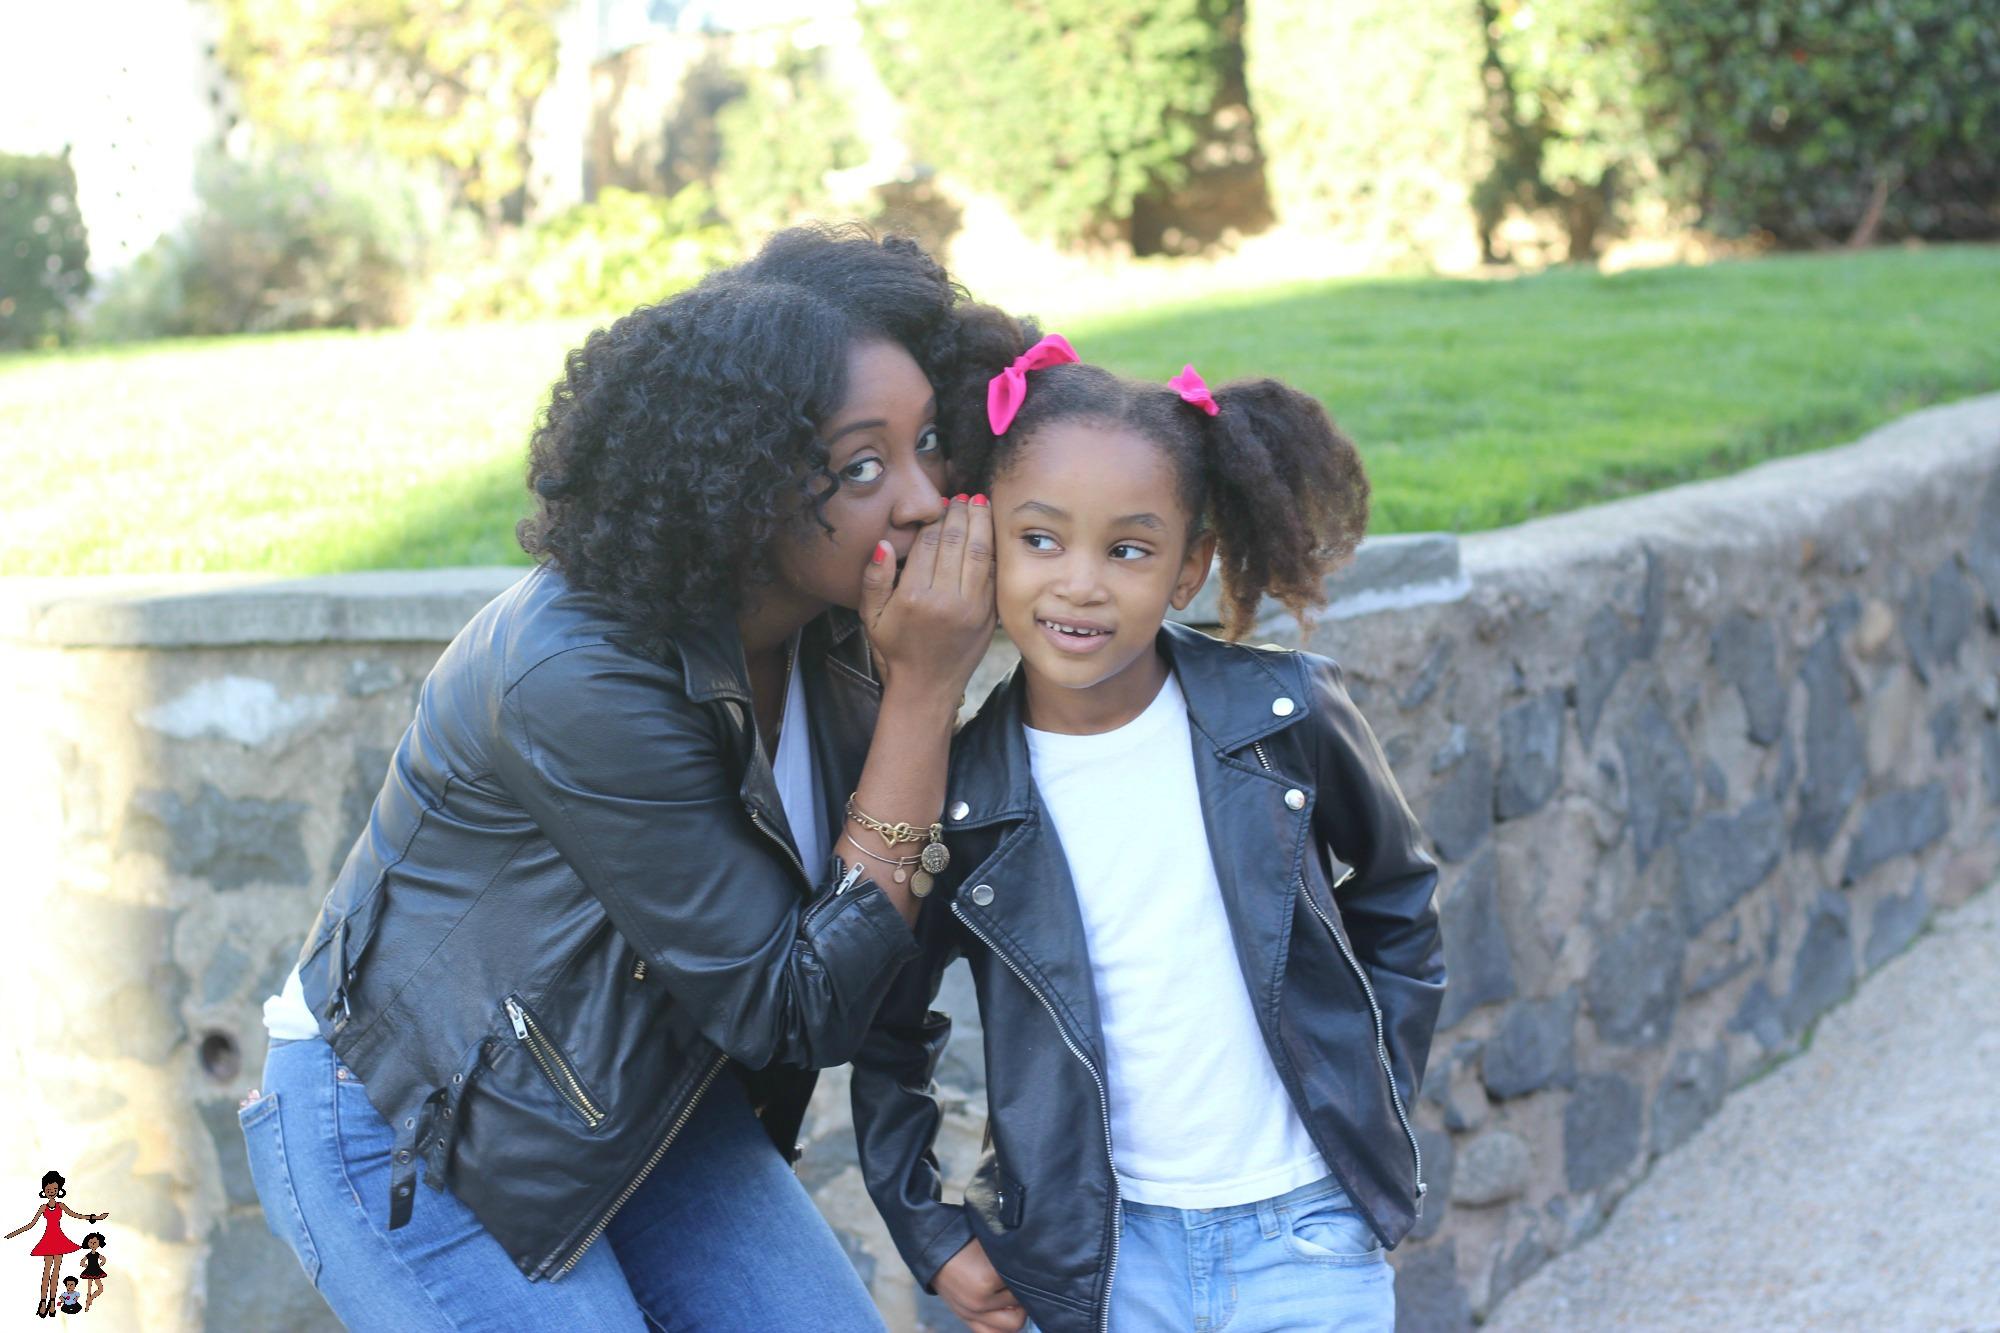 Let's Teach Our Daughters To Speak Beautiful - Rattles & Heels